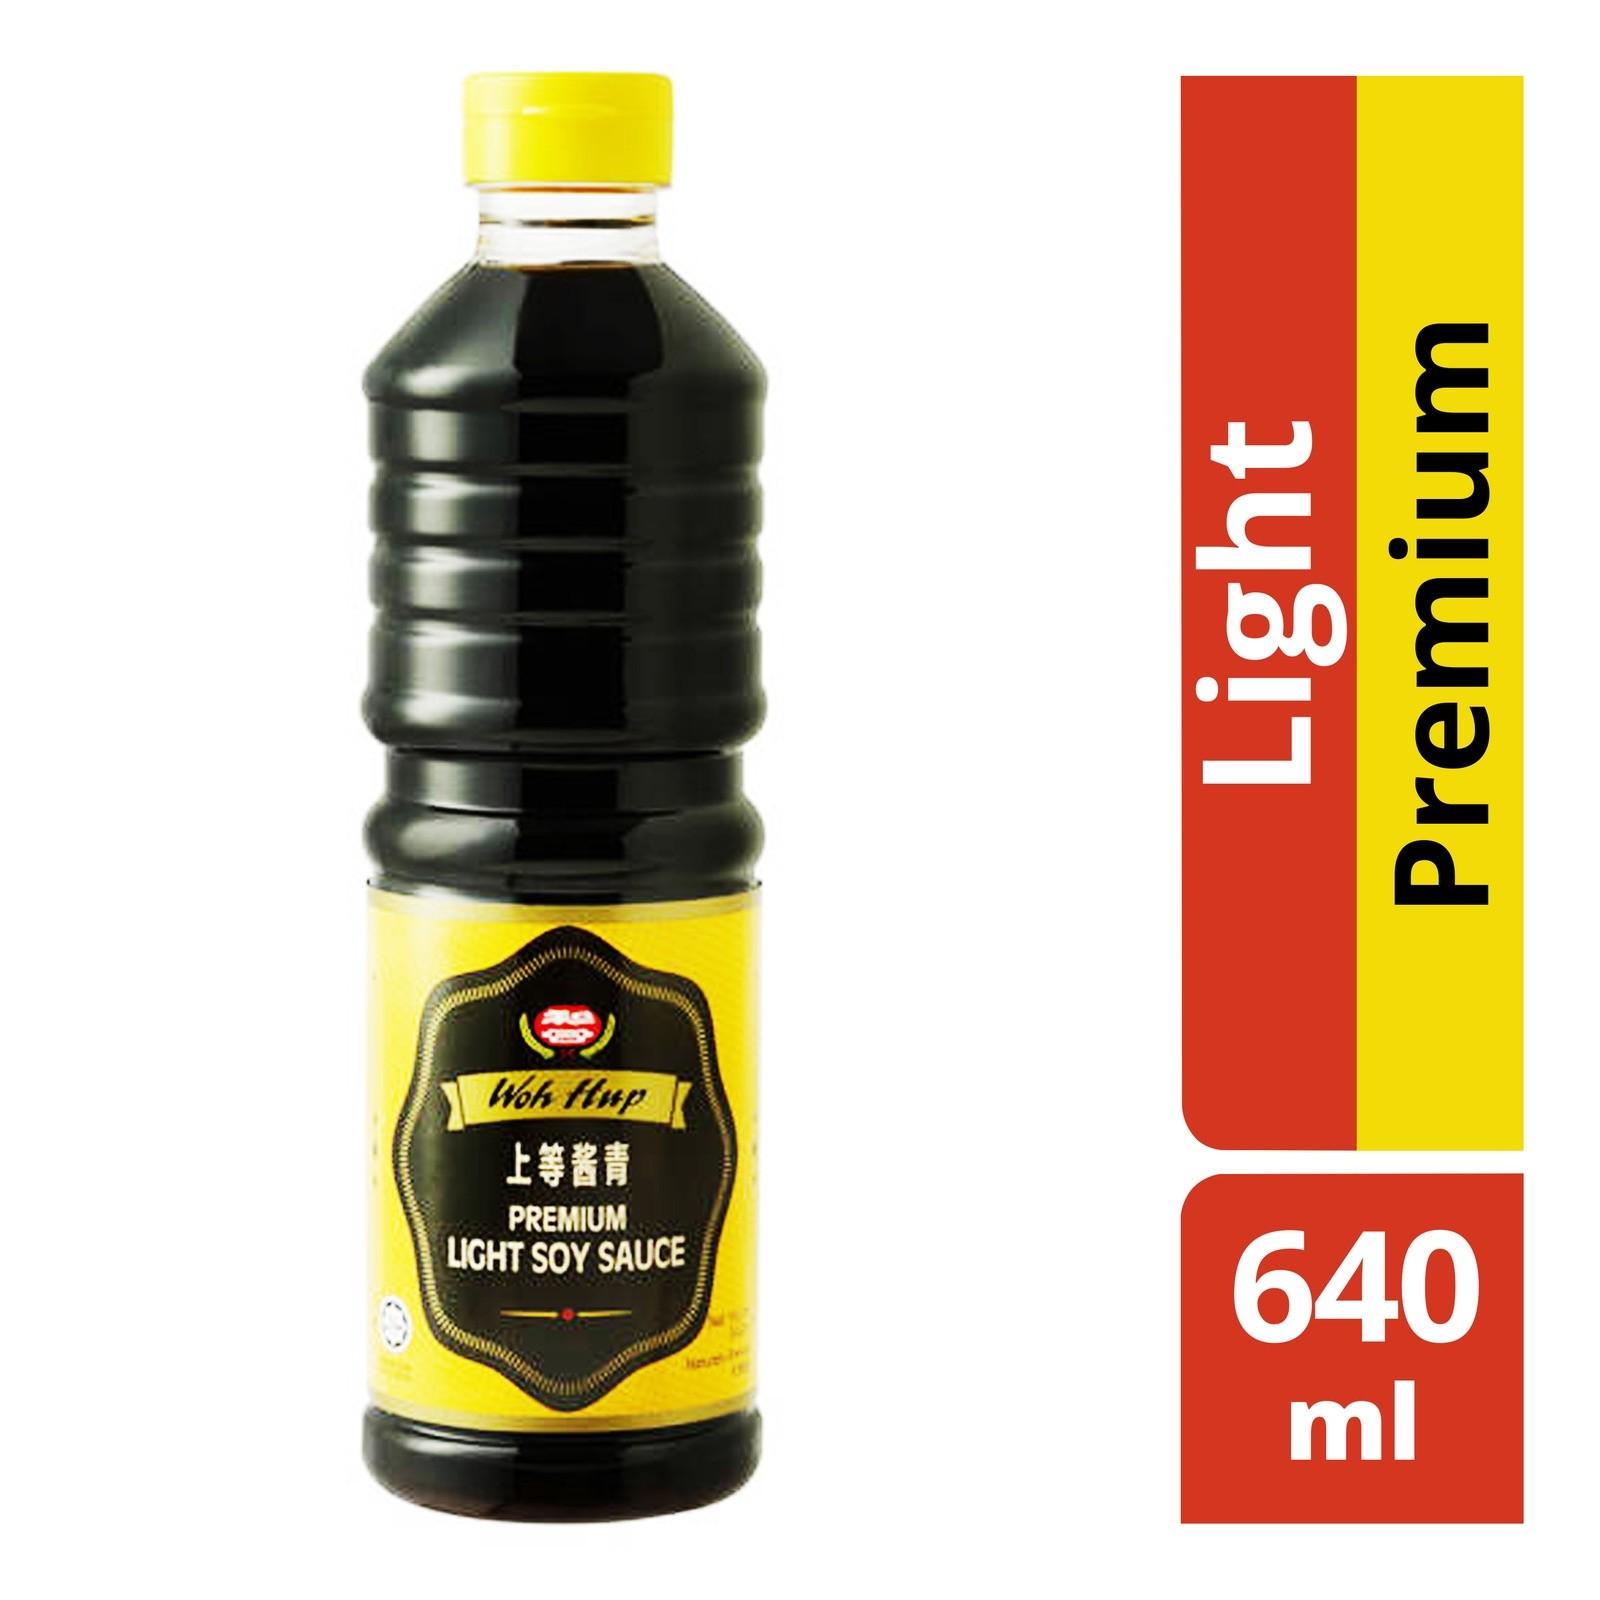 Woh Hup Premium Light Soy Sauce